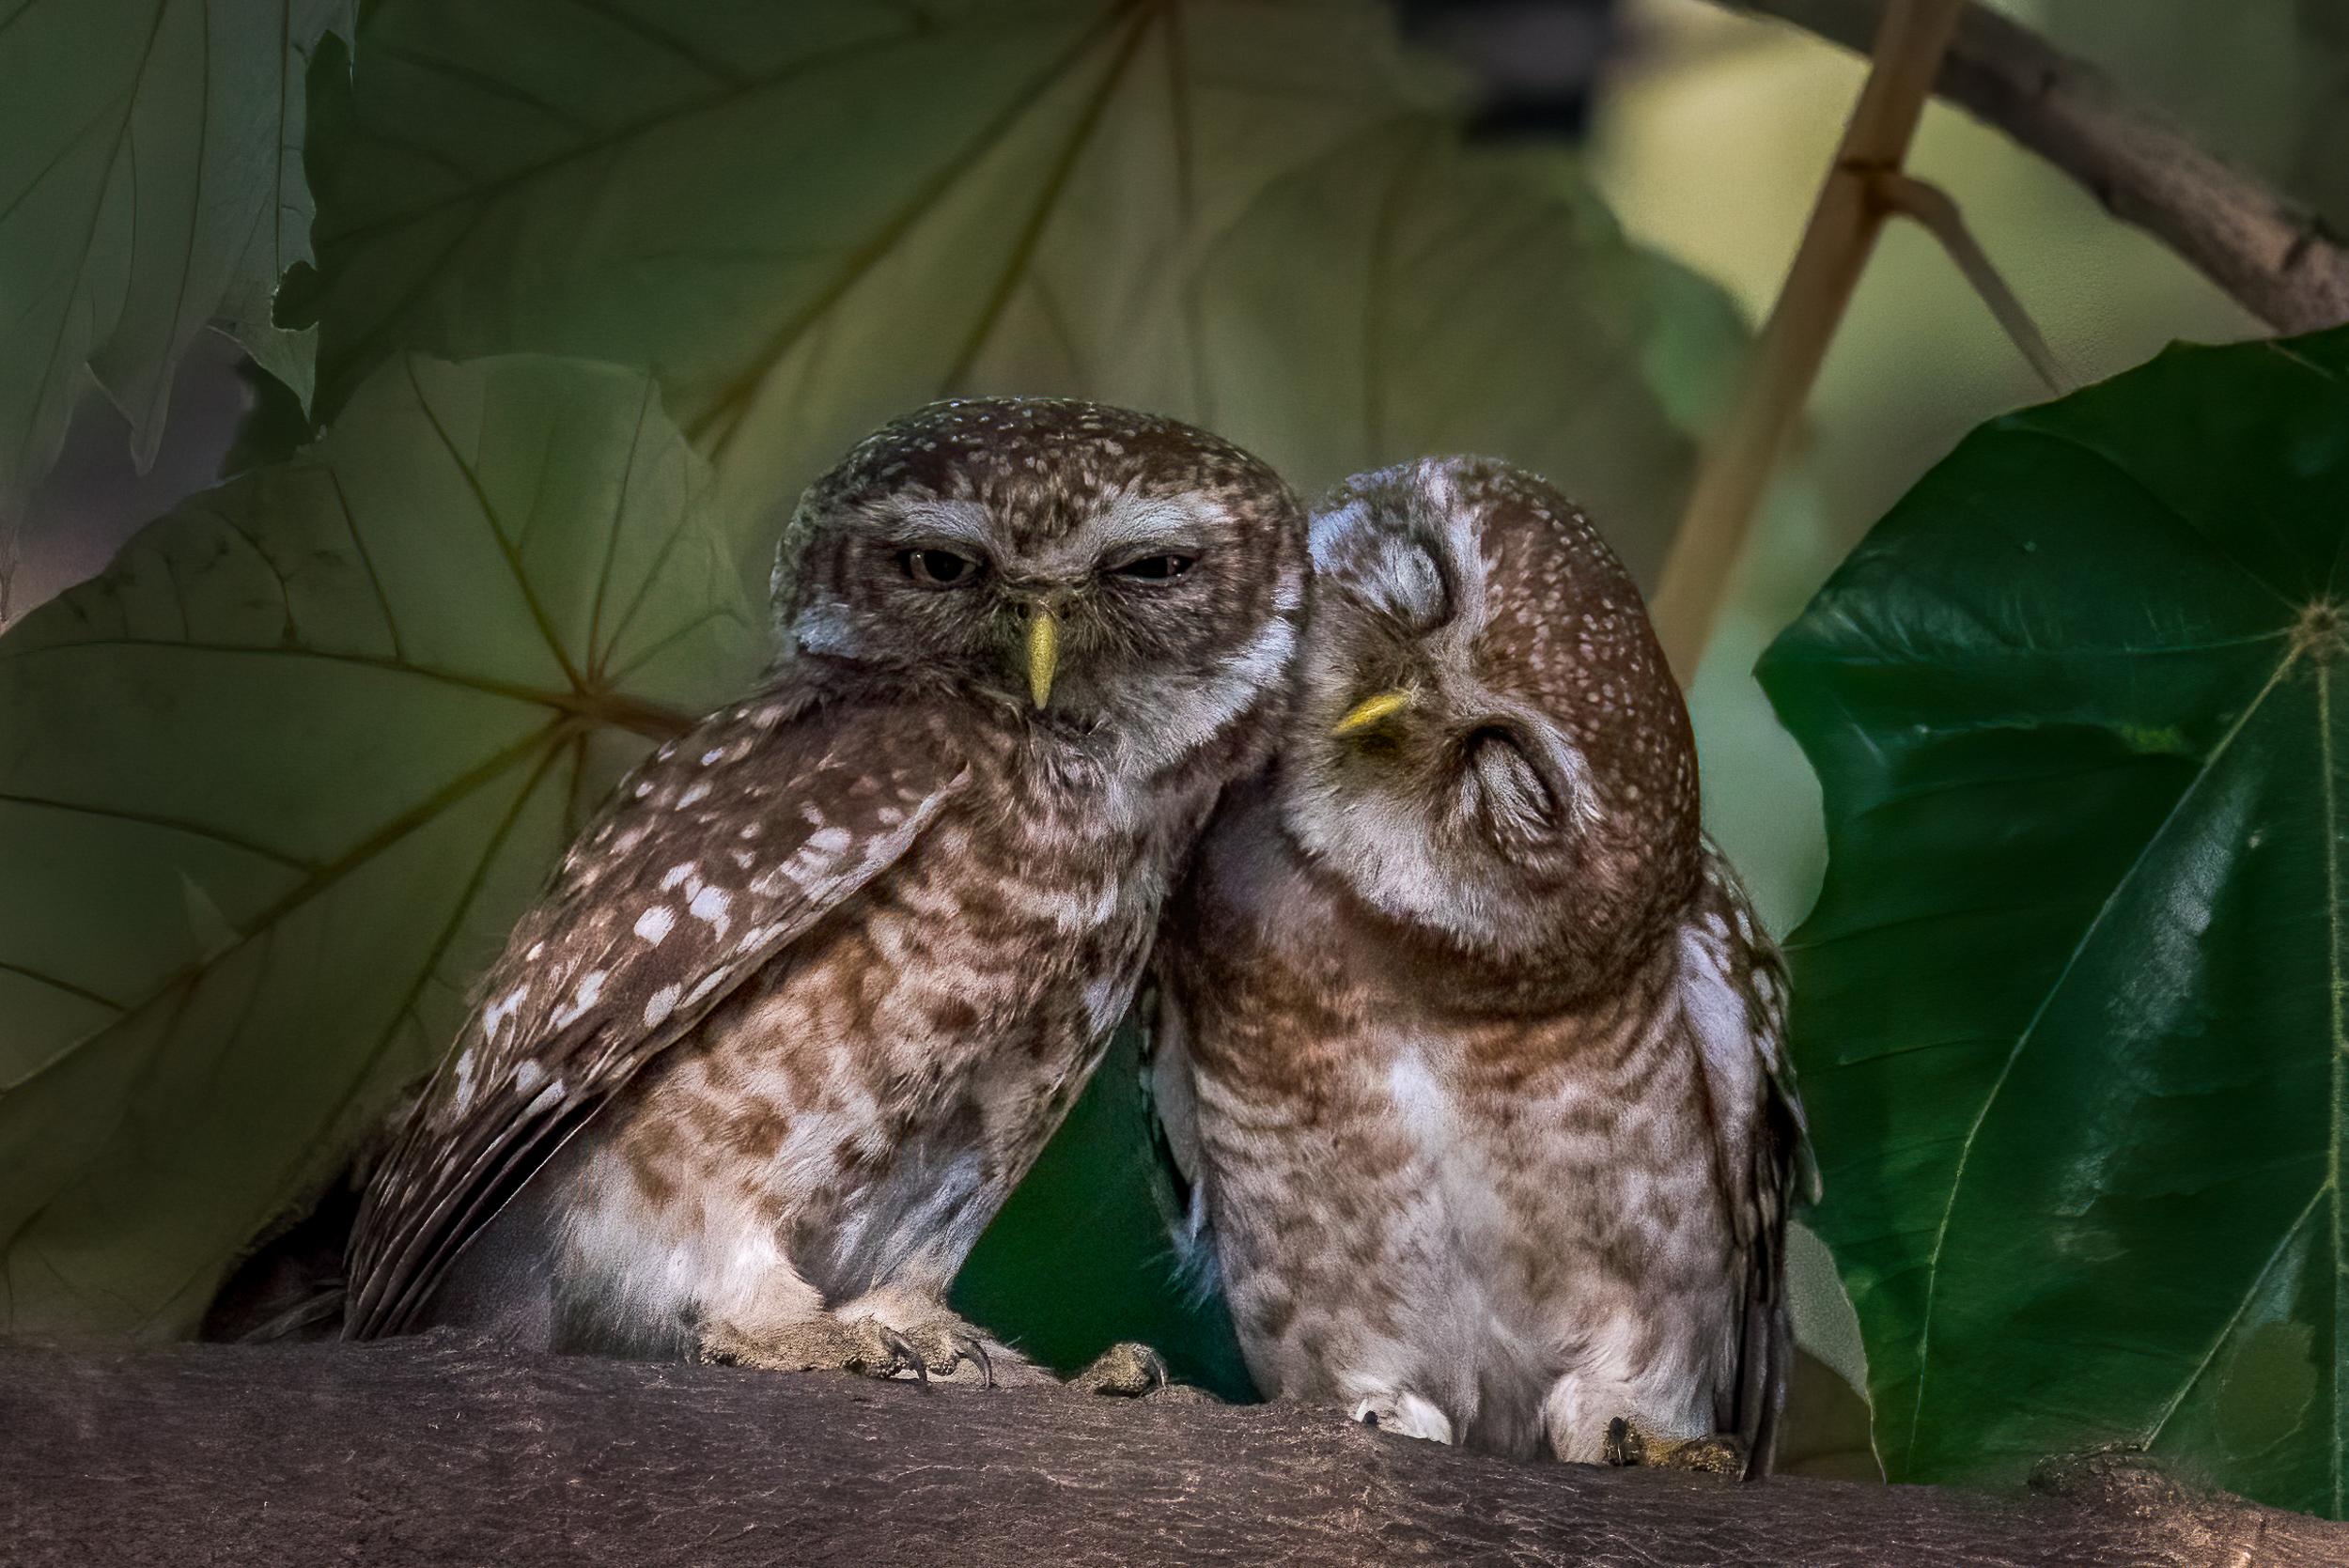 Owls sitting on tree